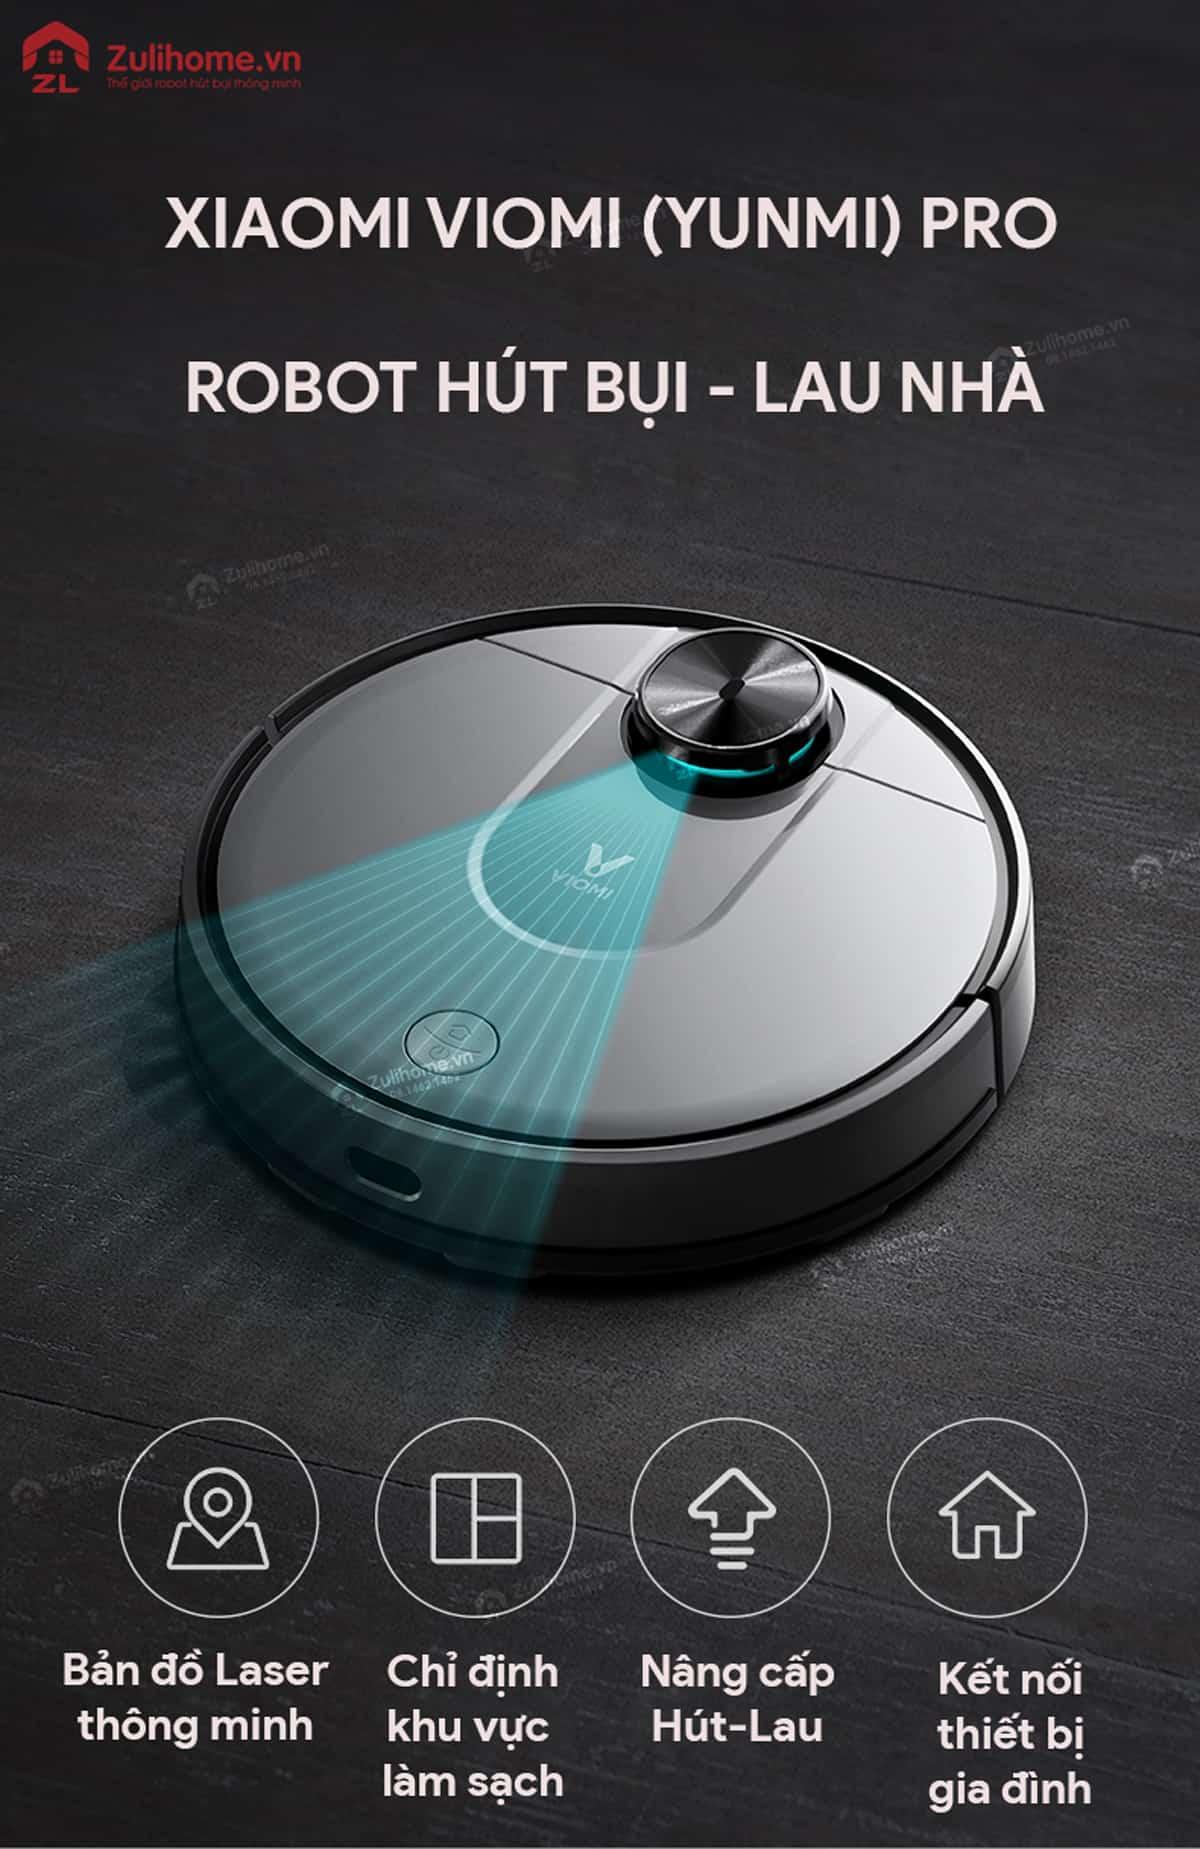 Xiaomi Viomi Yunmi